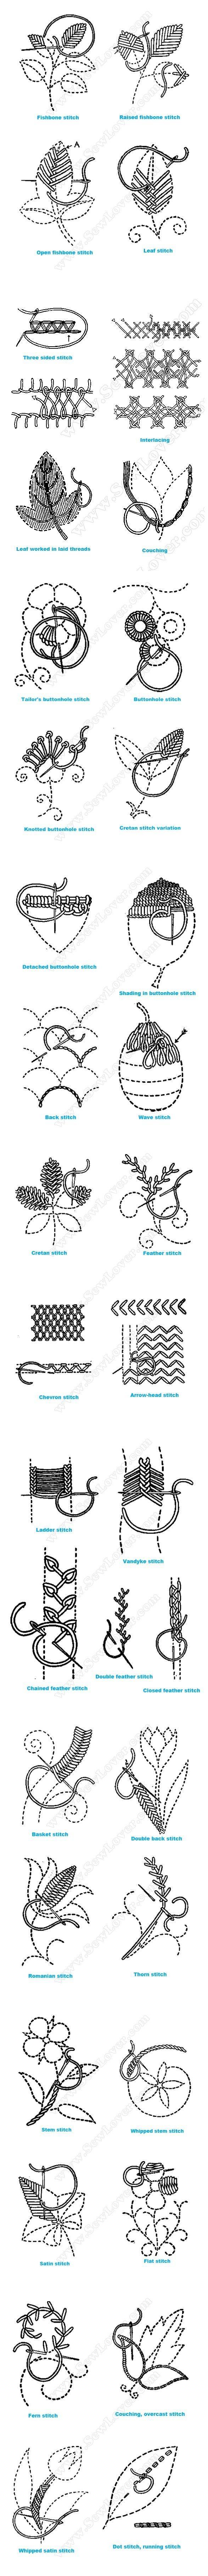 2127 best Bordados a mão images on Pinterest | Stickstiche ...